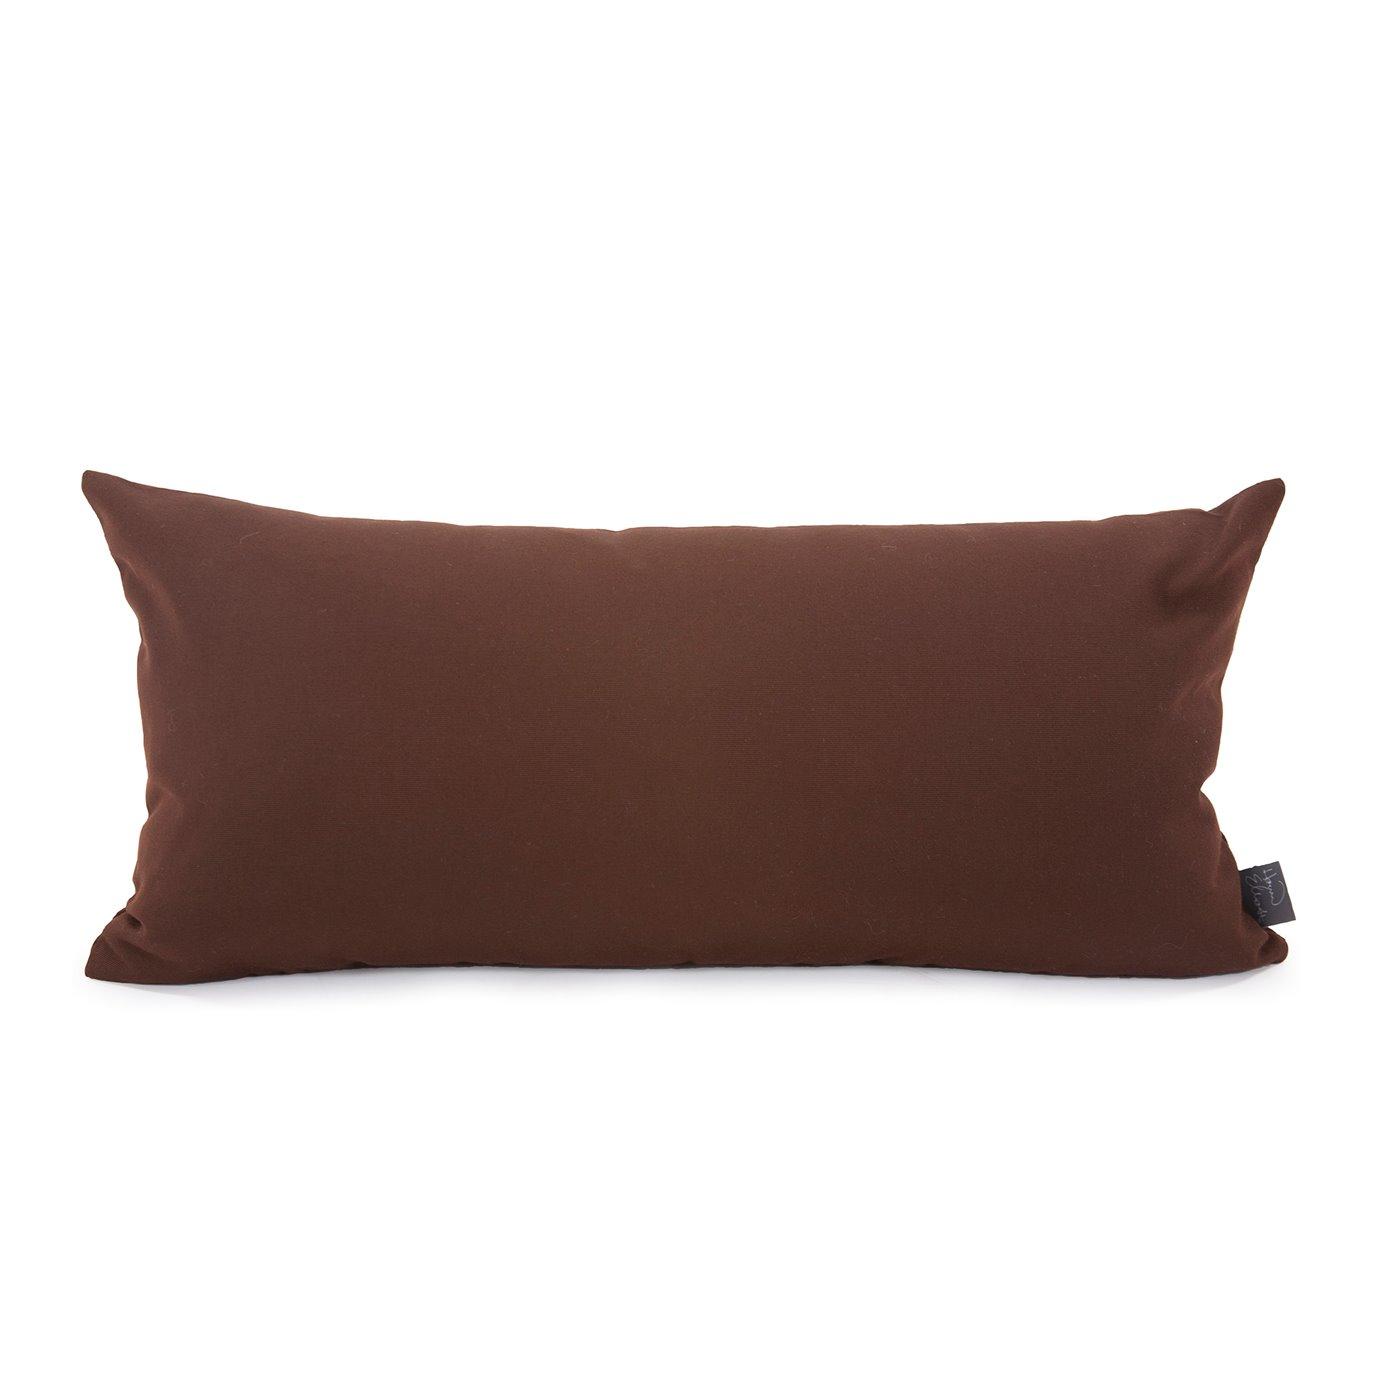 Howard Elliott Kidney Pillow Outdoor Sunbrella Seascape Chocolate